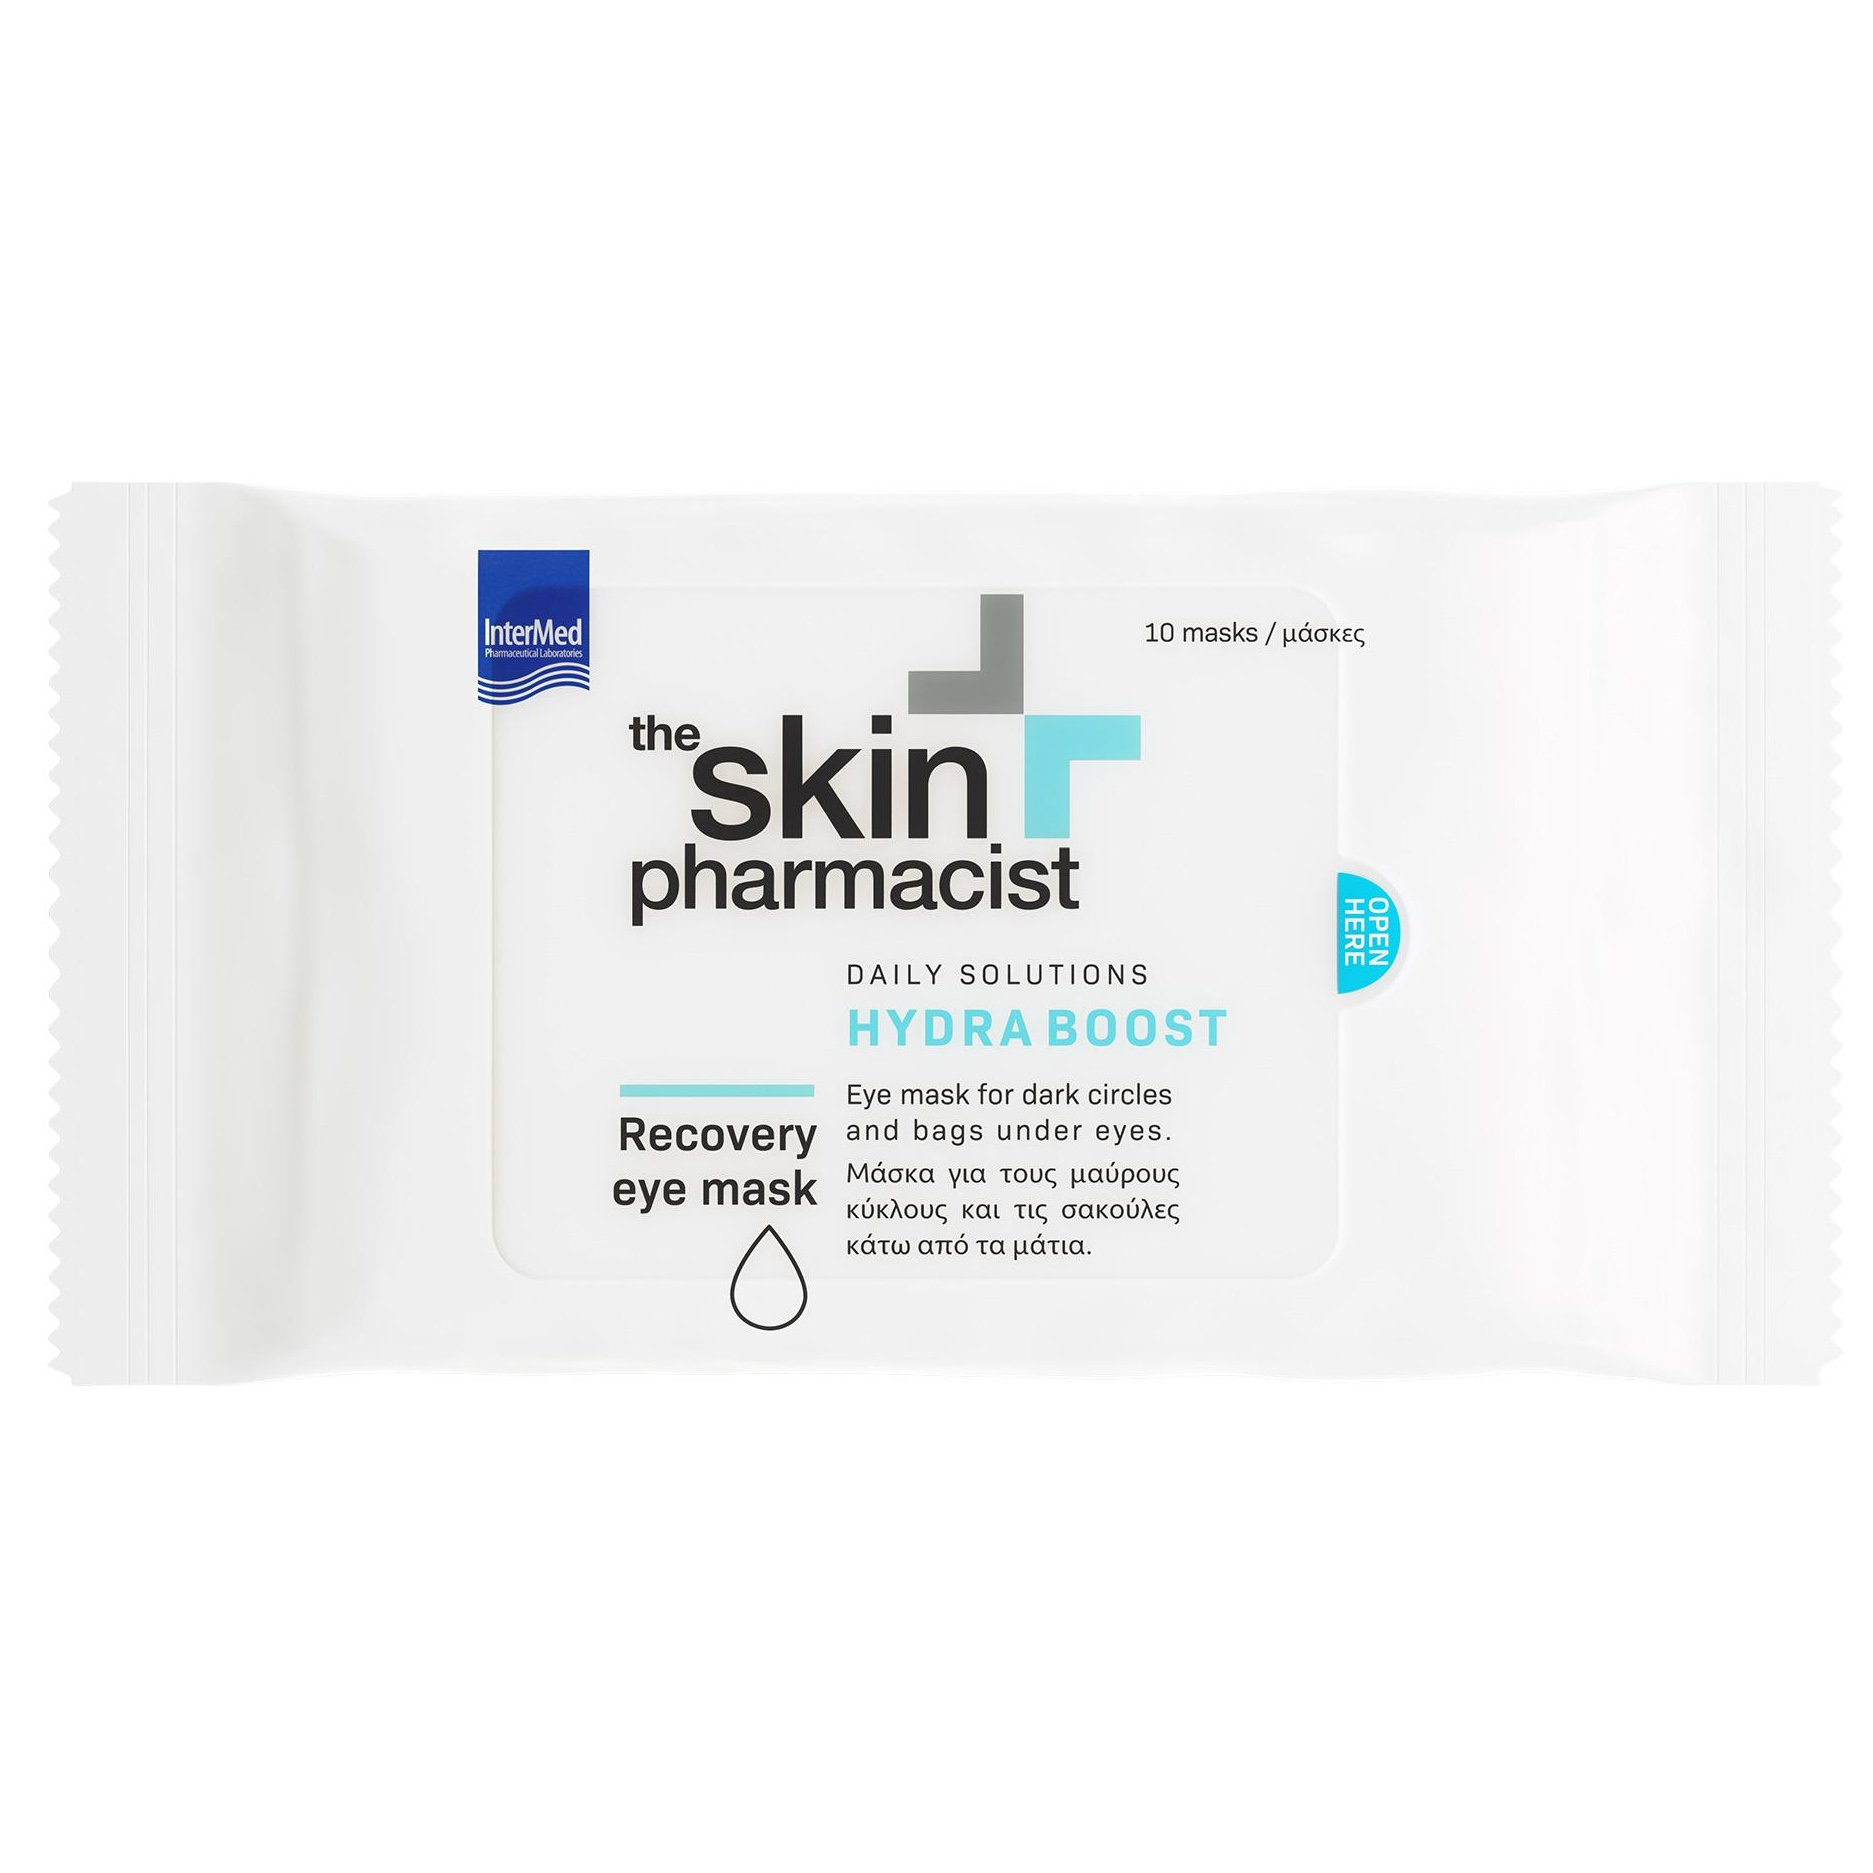 The Skin Pharmacist Hydra Boost Recovery Eye Mask Μάσκα για τους Μαύρους Κύκλους & τις Σακούλες Κάτω Από τα Μάτια 10Masks x 4ml